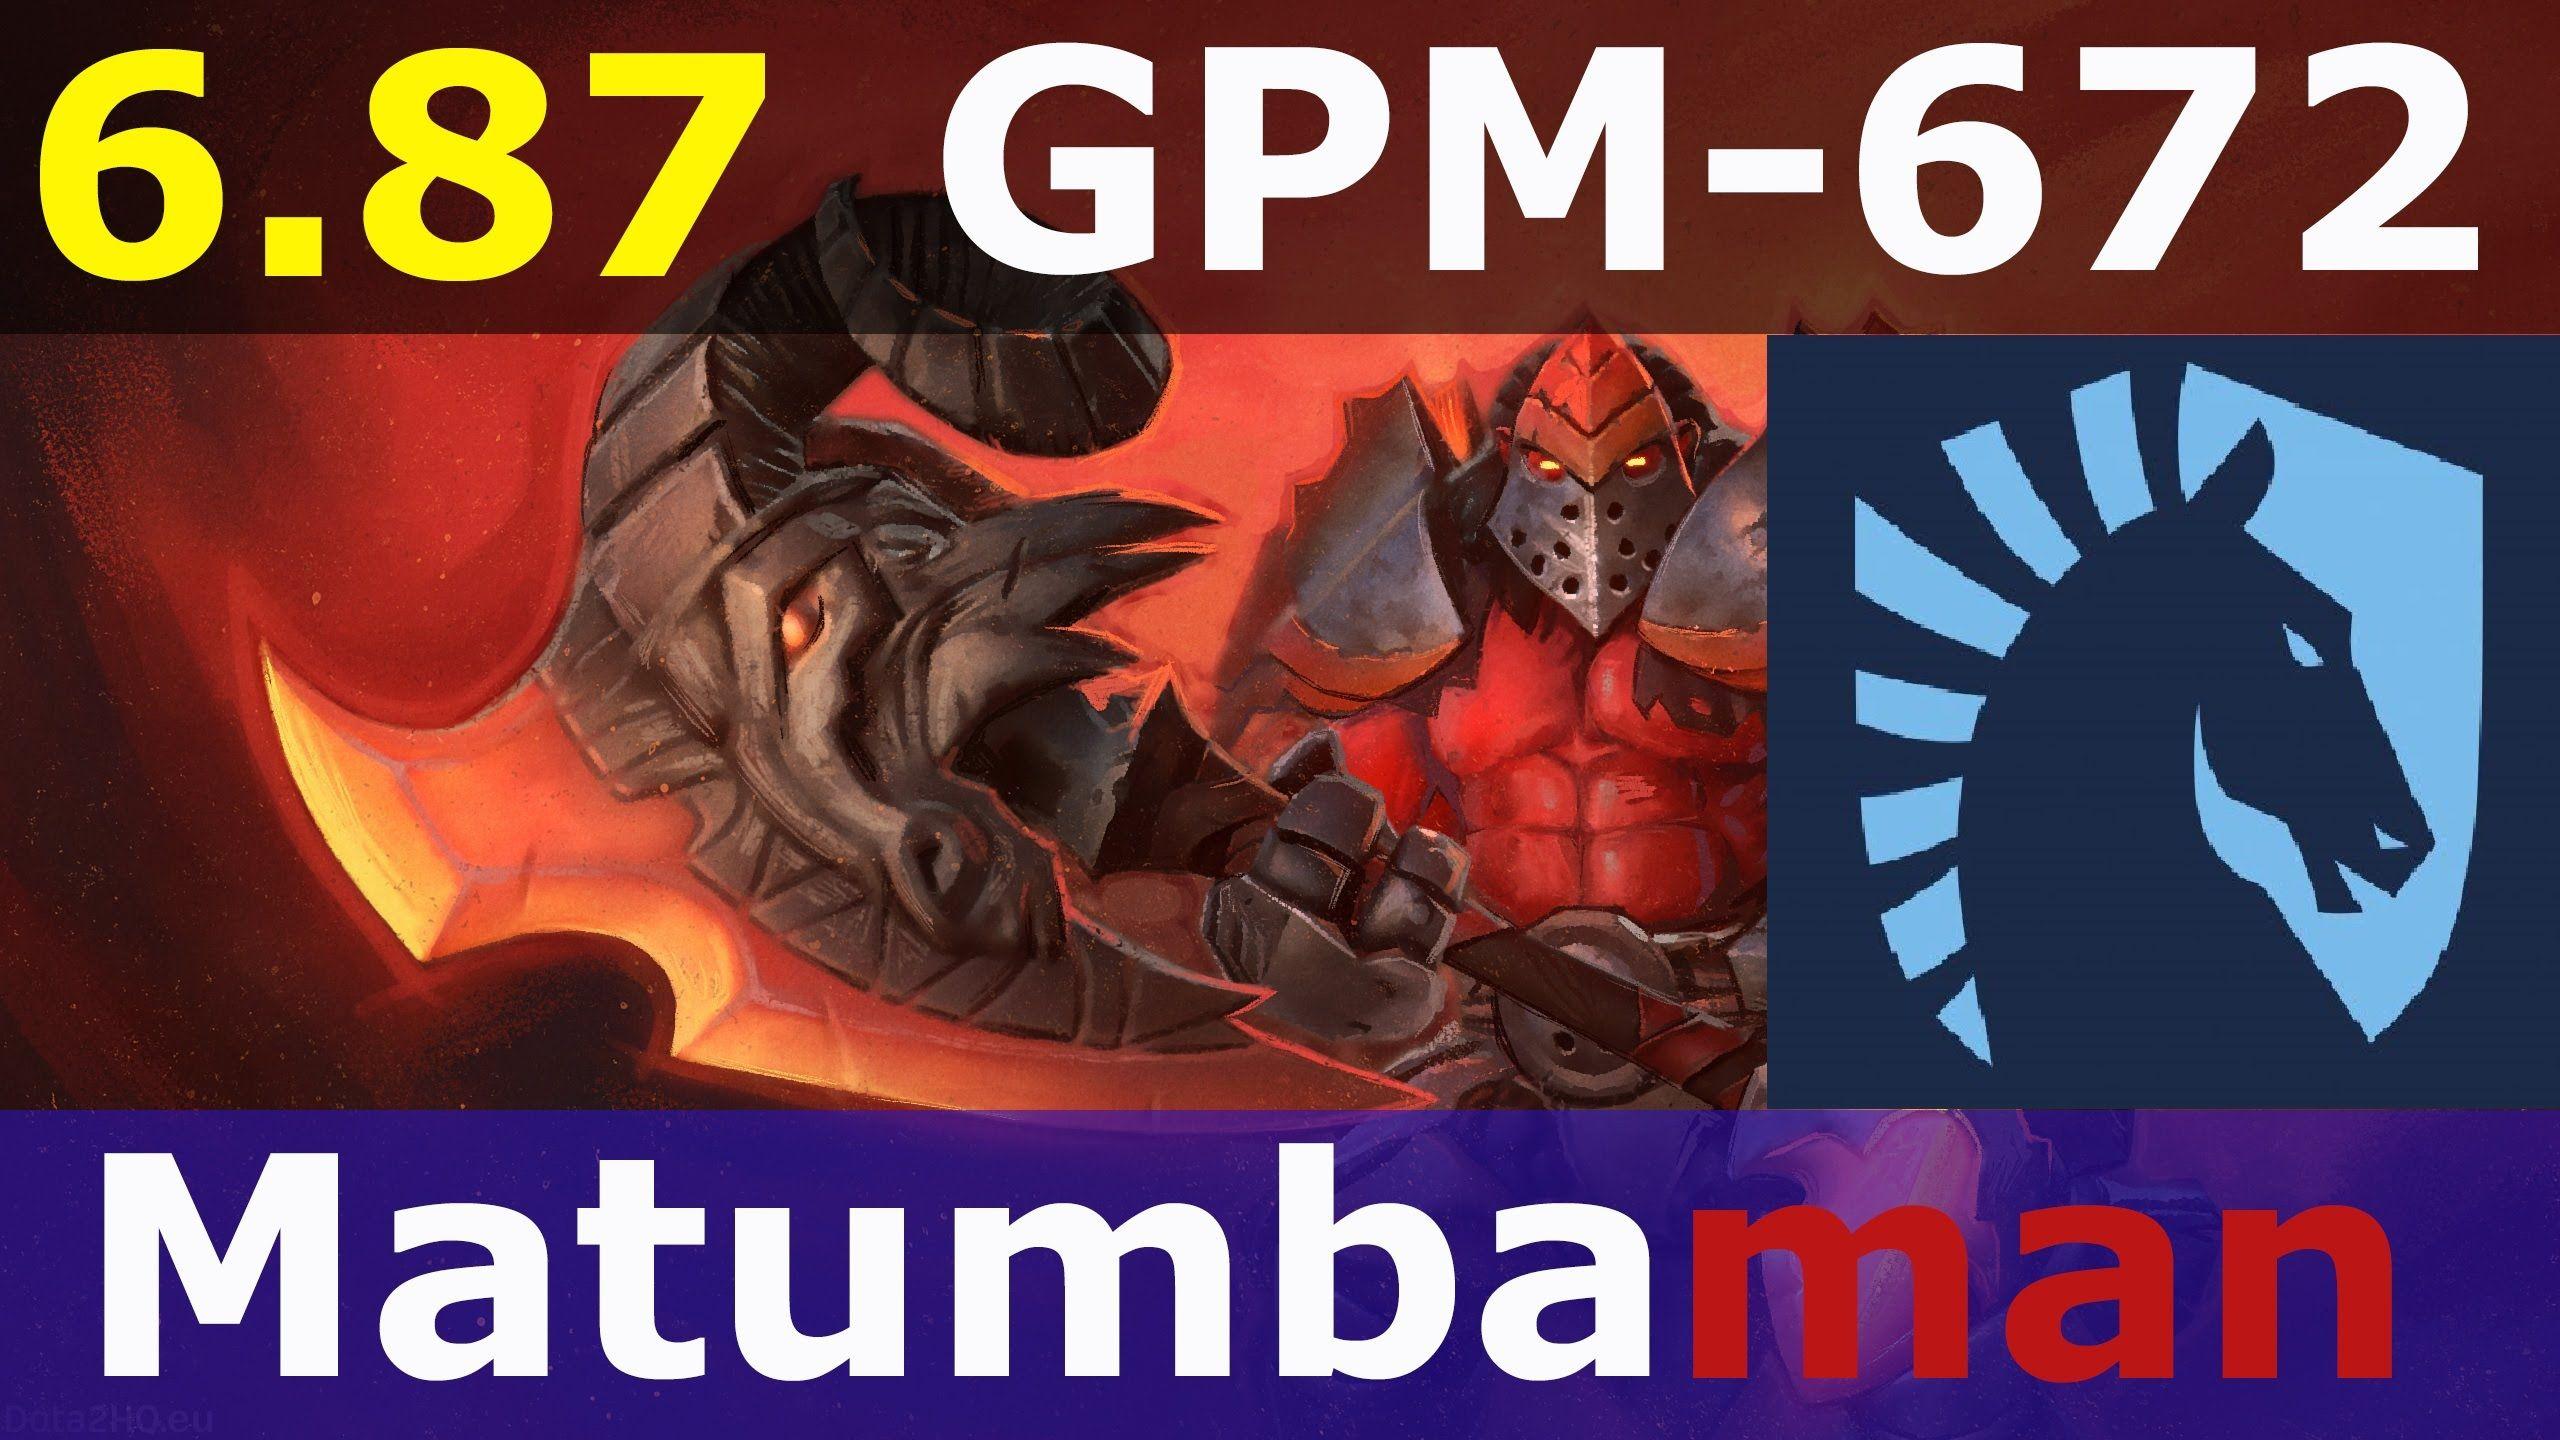 Axe dota 2 patch 6.87 Team Liquid Matumbaman 7700+ MMR 672 - GPM